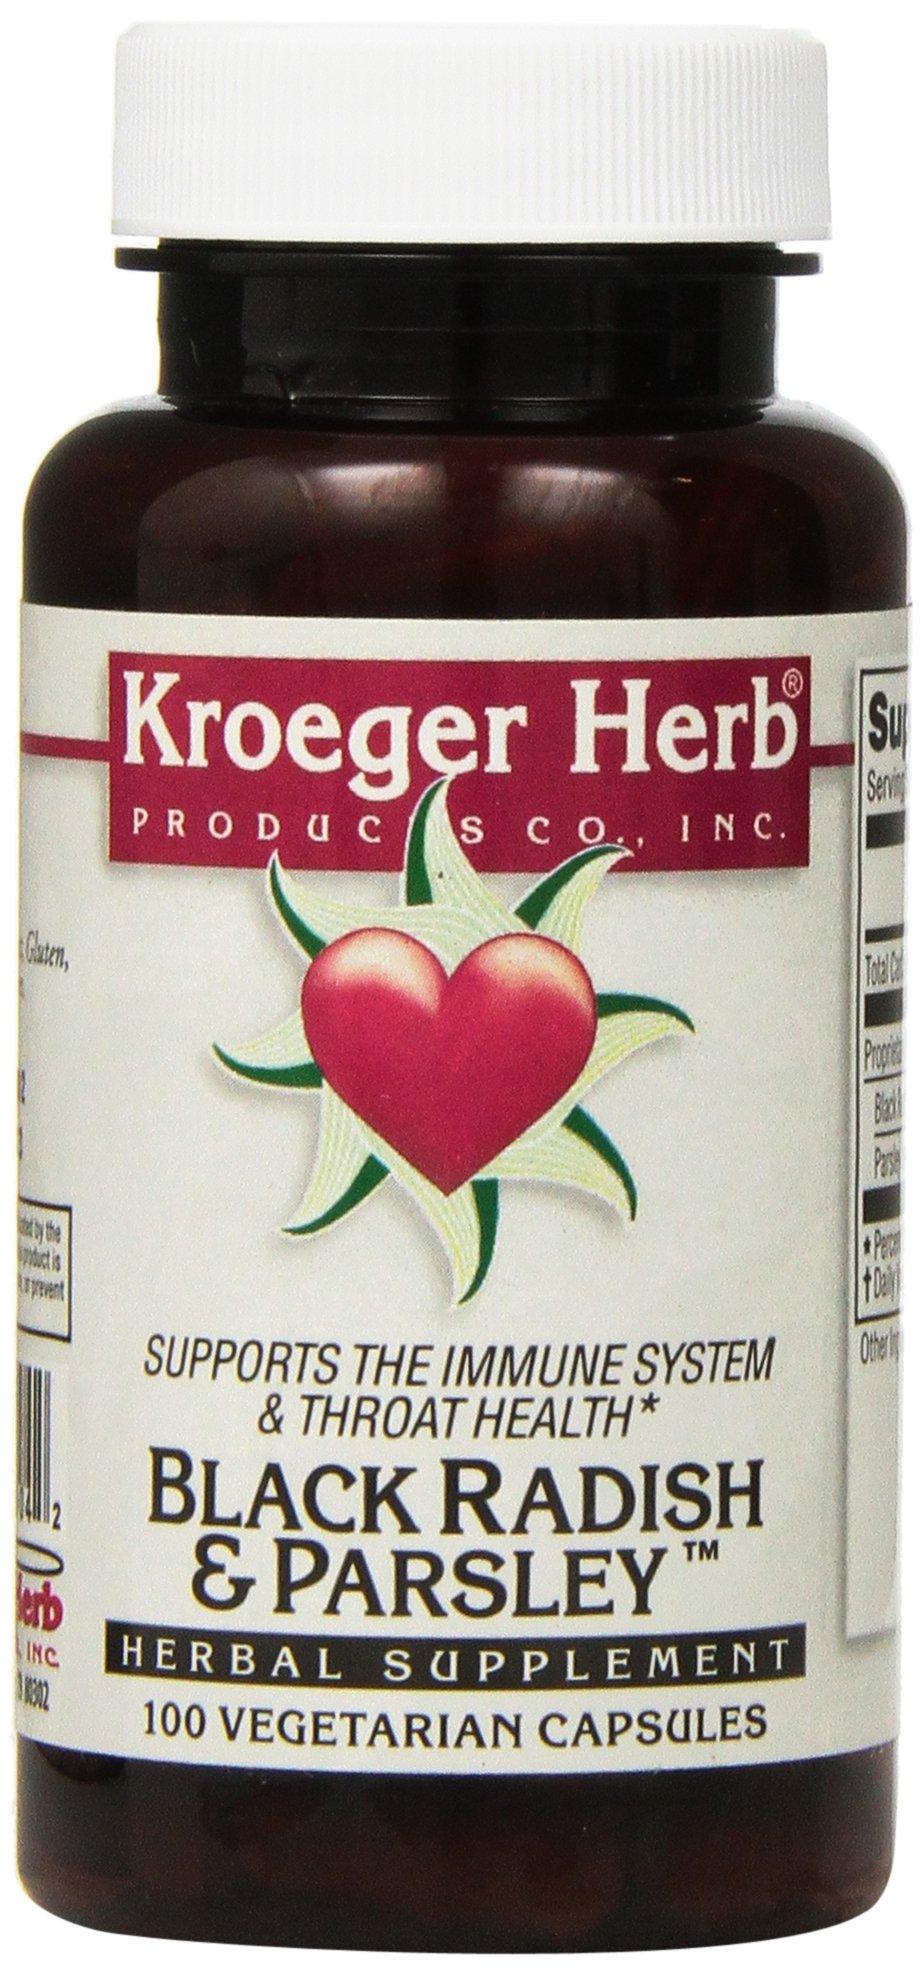 Kroeger Herb Black Radish and Parsley Capsules, 100 Count